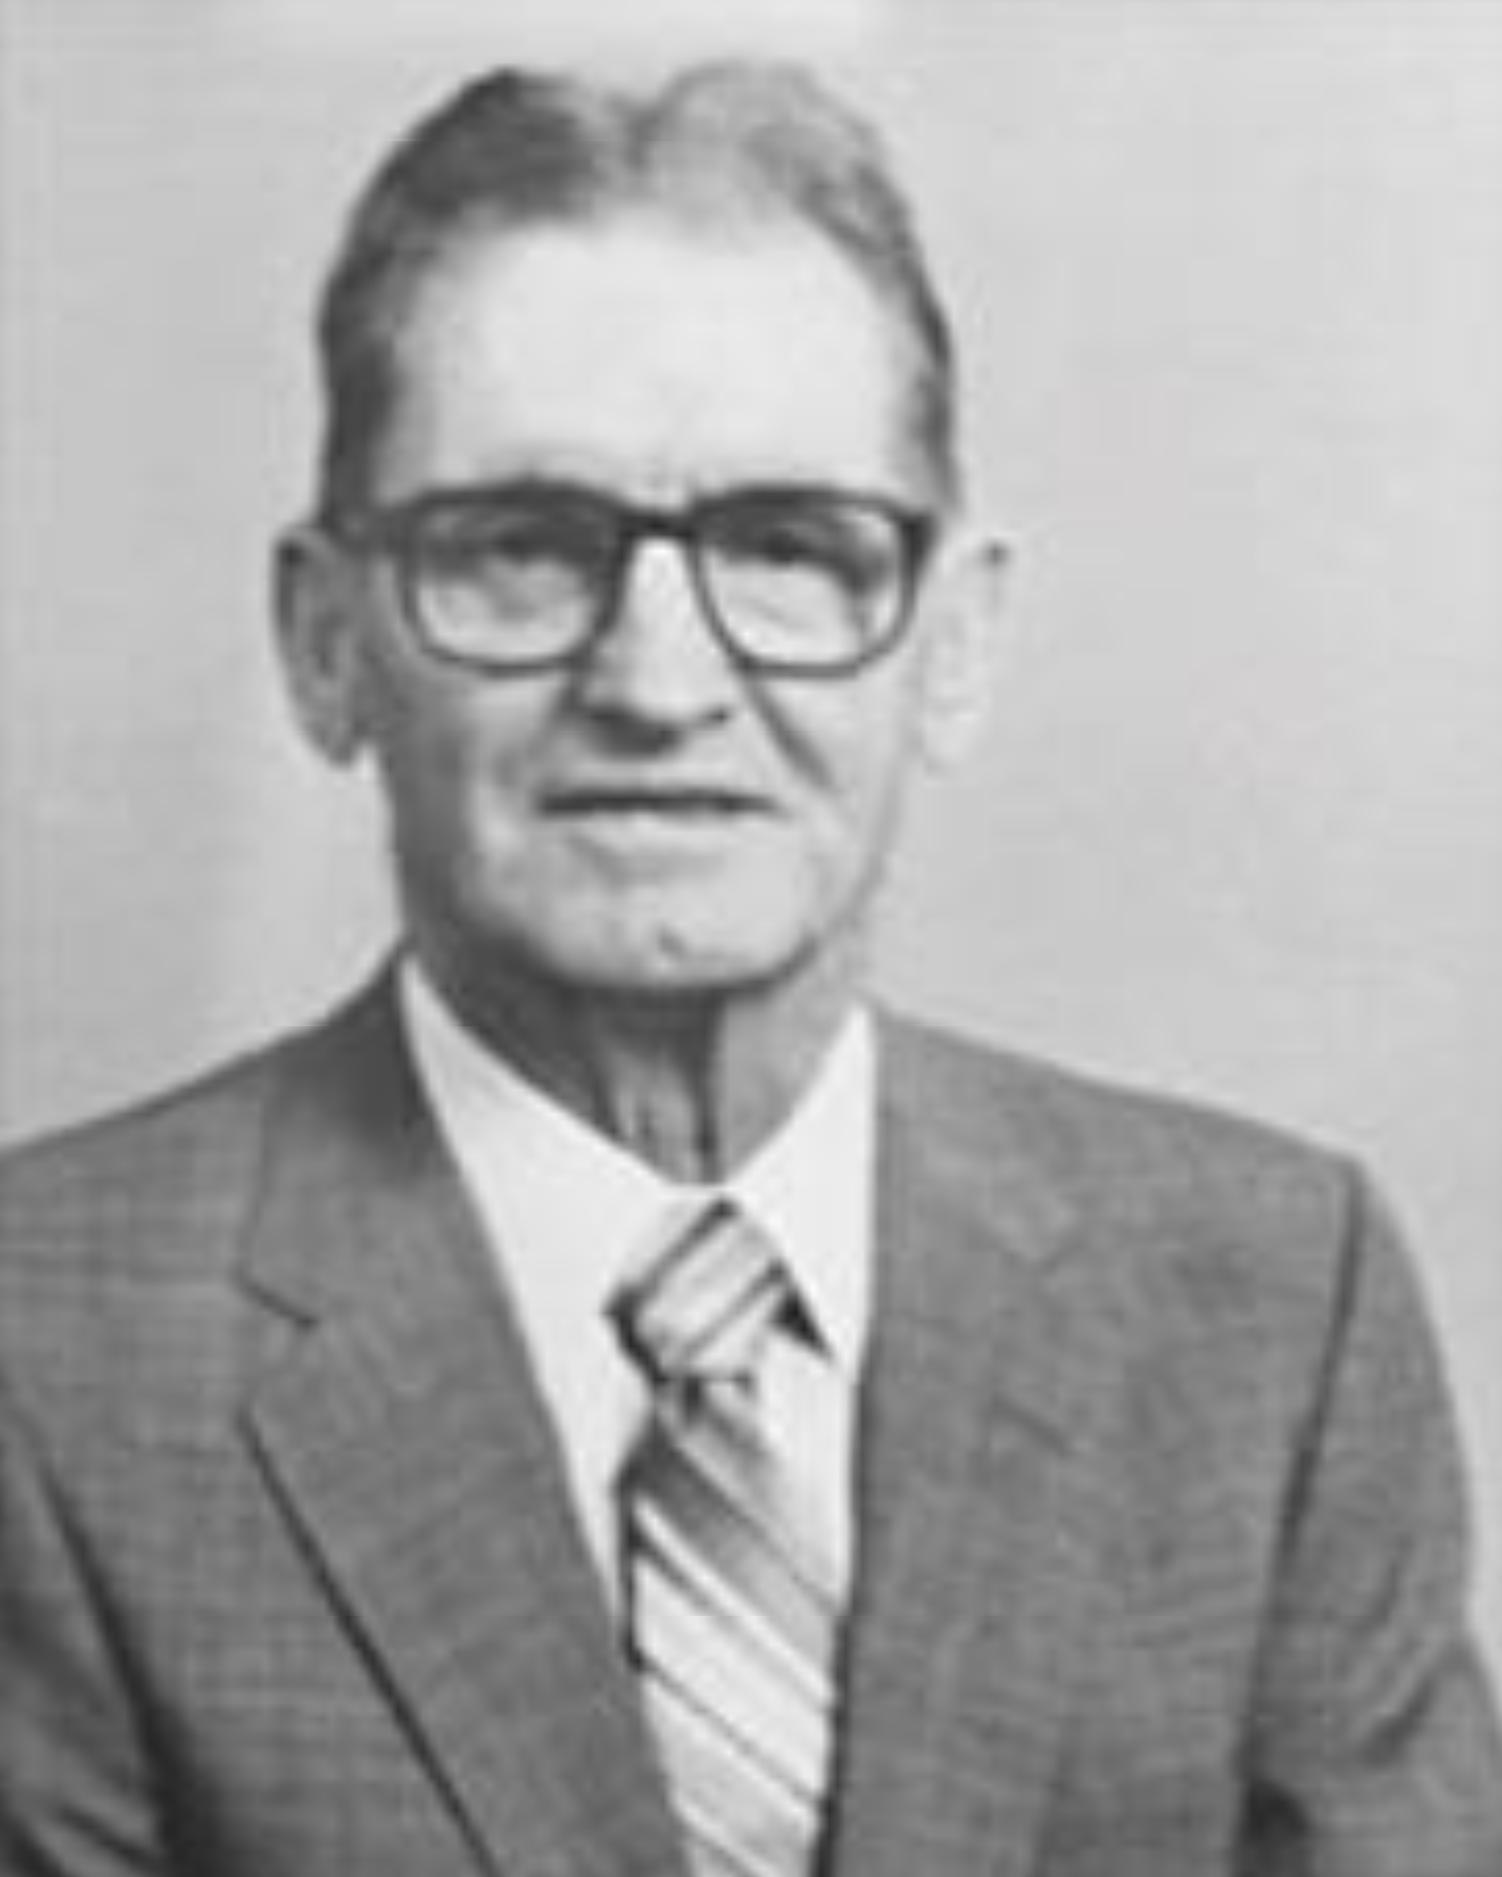 FRANK P. MCCOLLUM